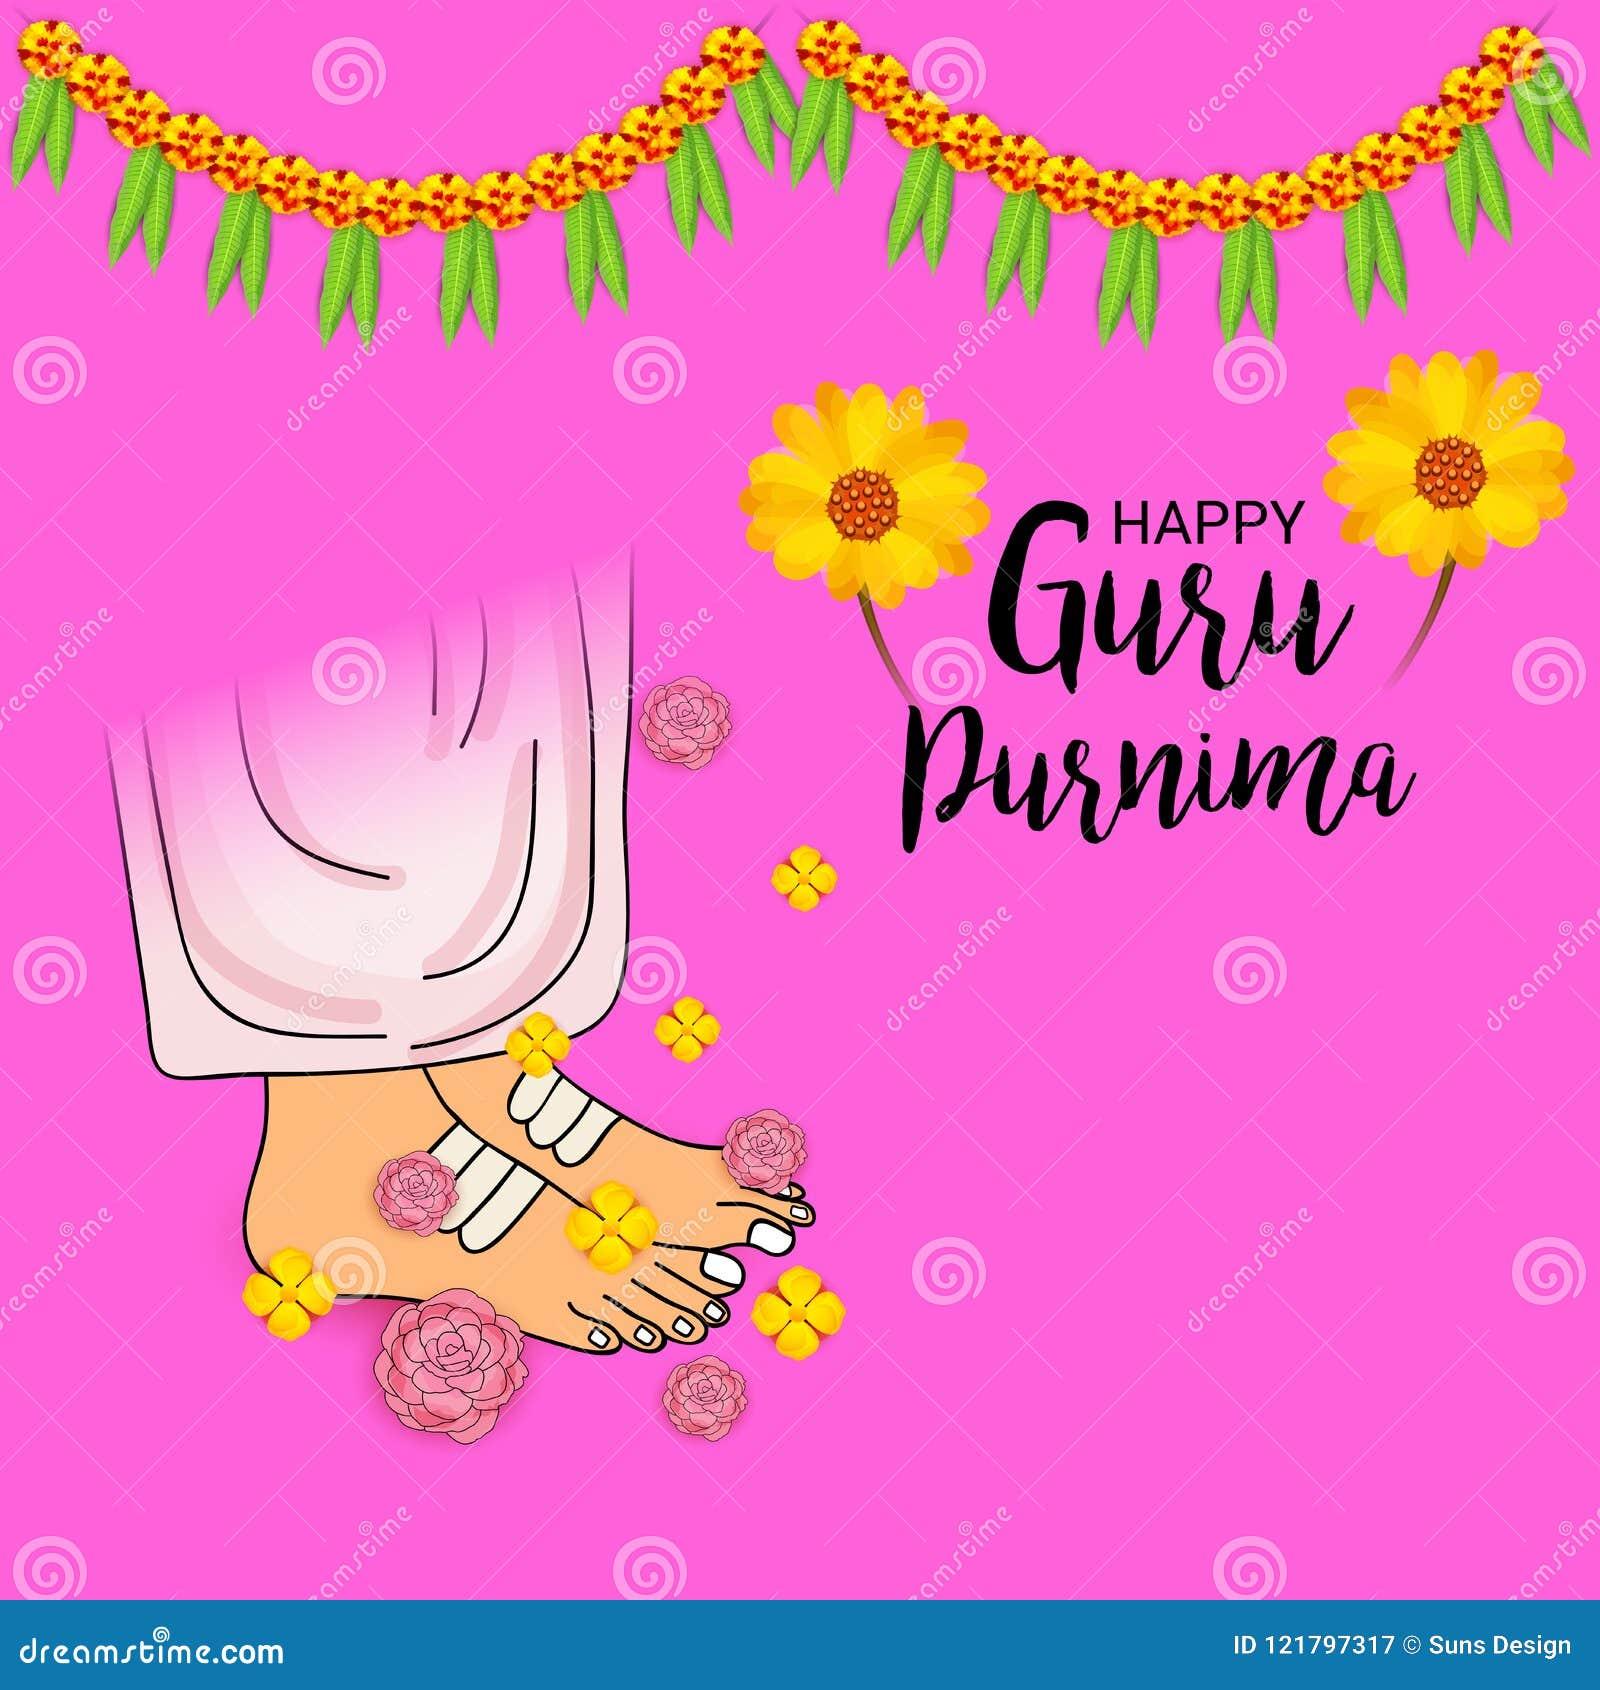 Guru Purnima Invitation Card Design Archives Car Insurance